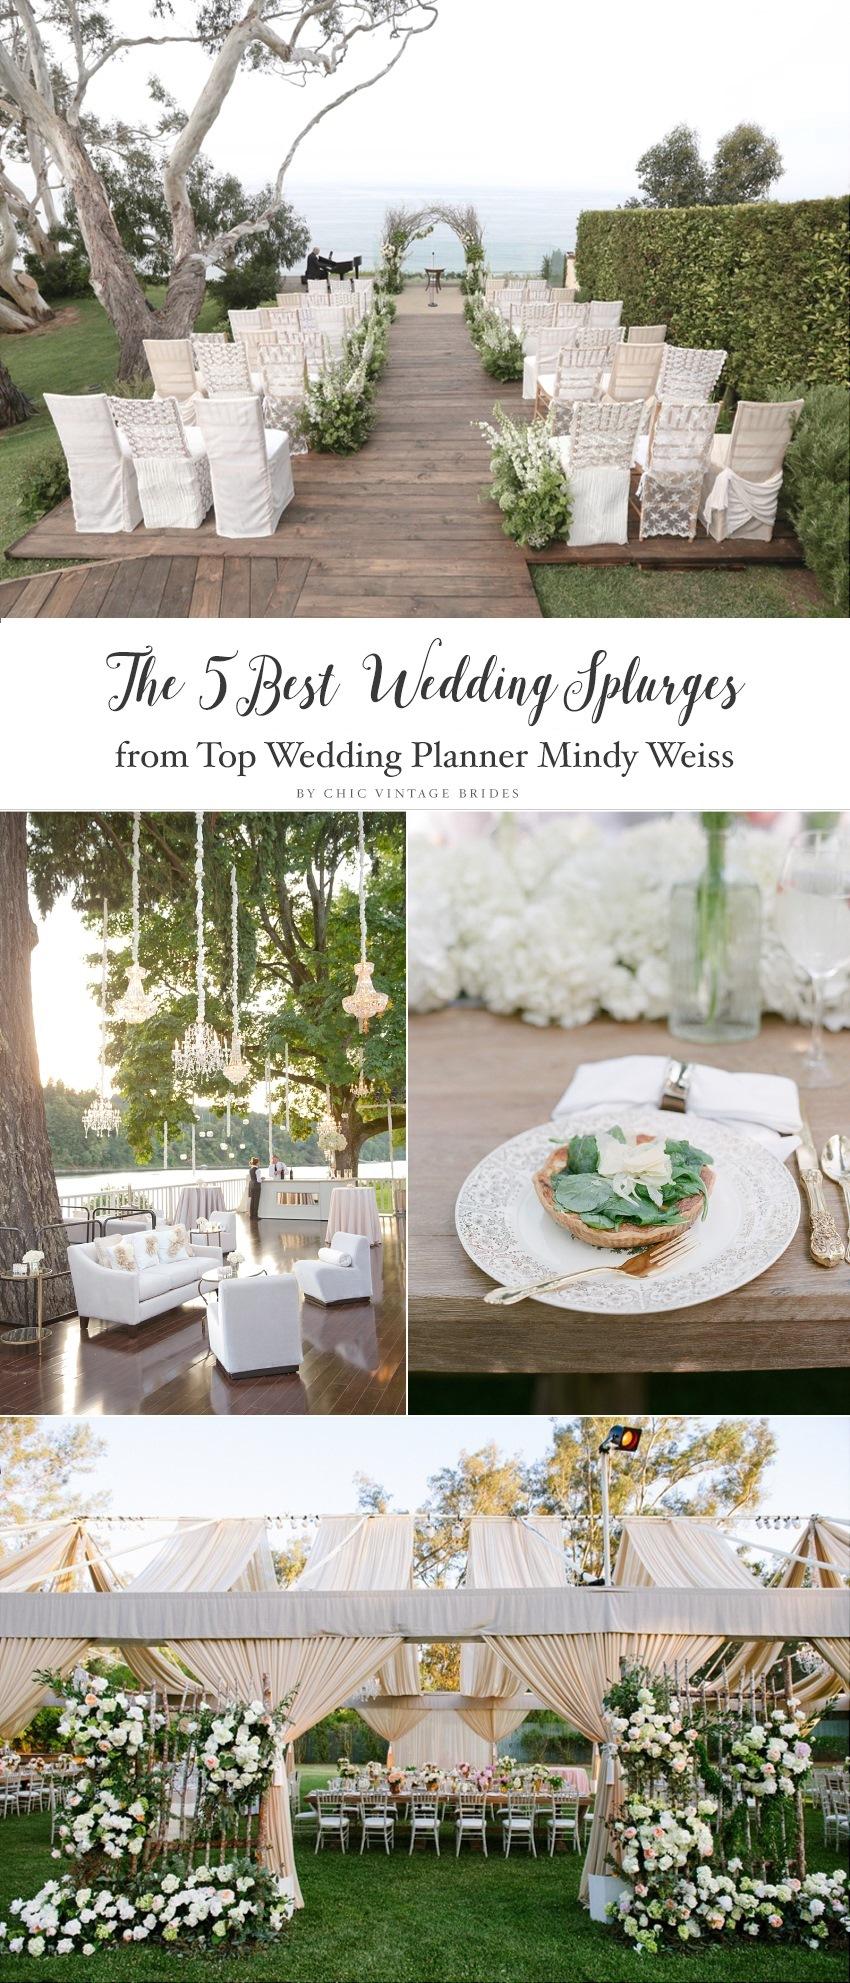 The Top 5 Wedding Splurges || Wow Factors for Your Wedding || 5 Unforgettable Wedding Details